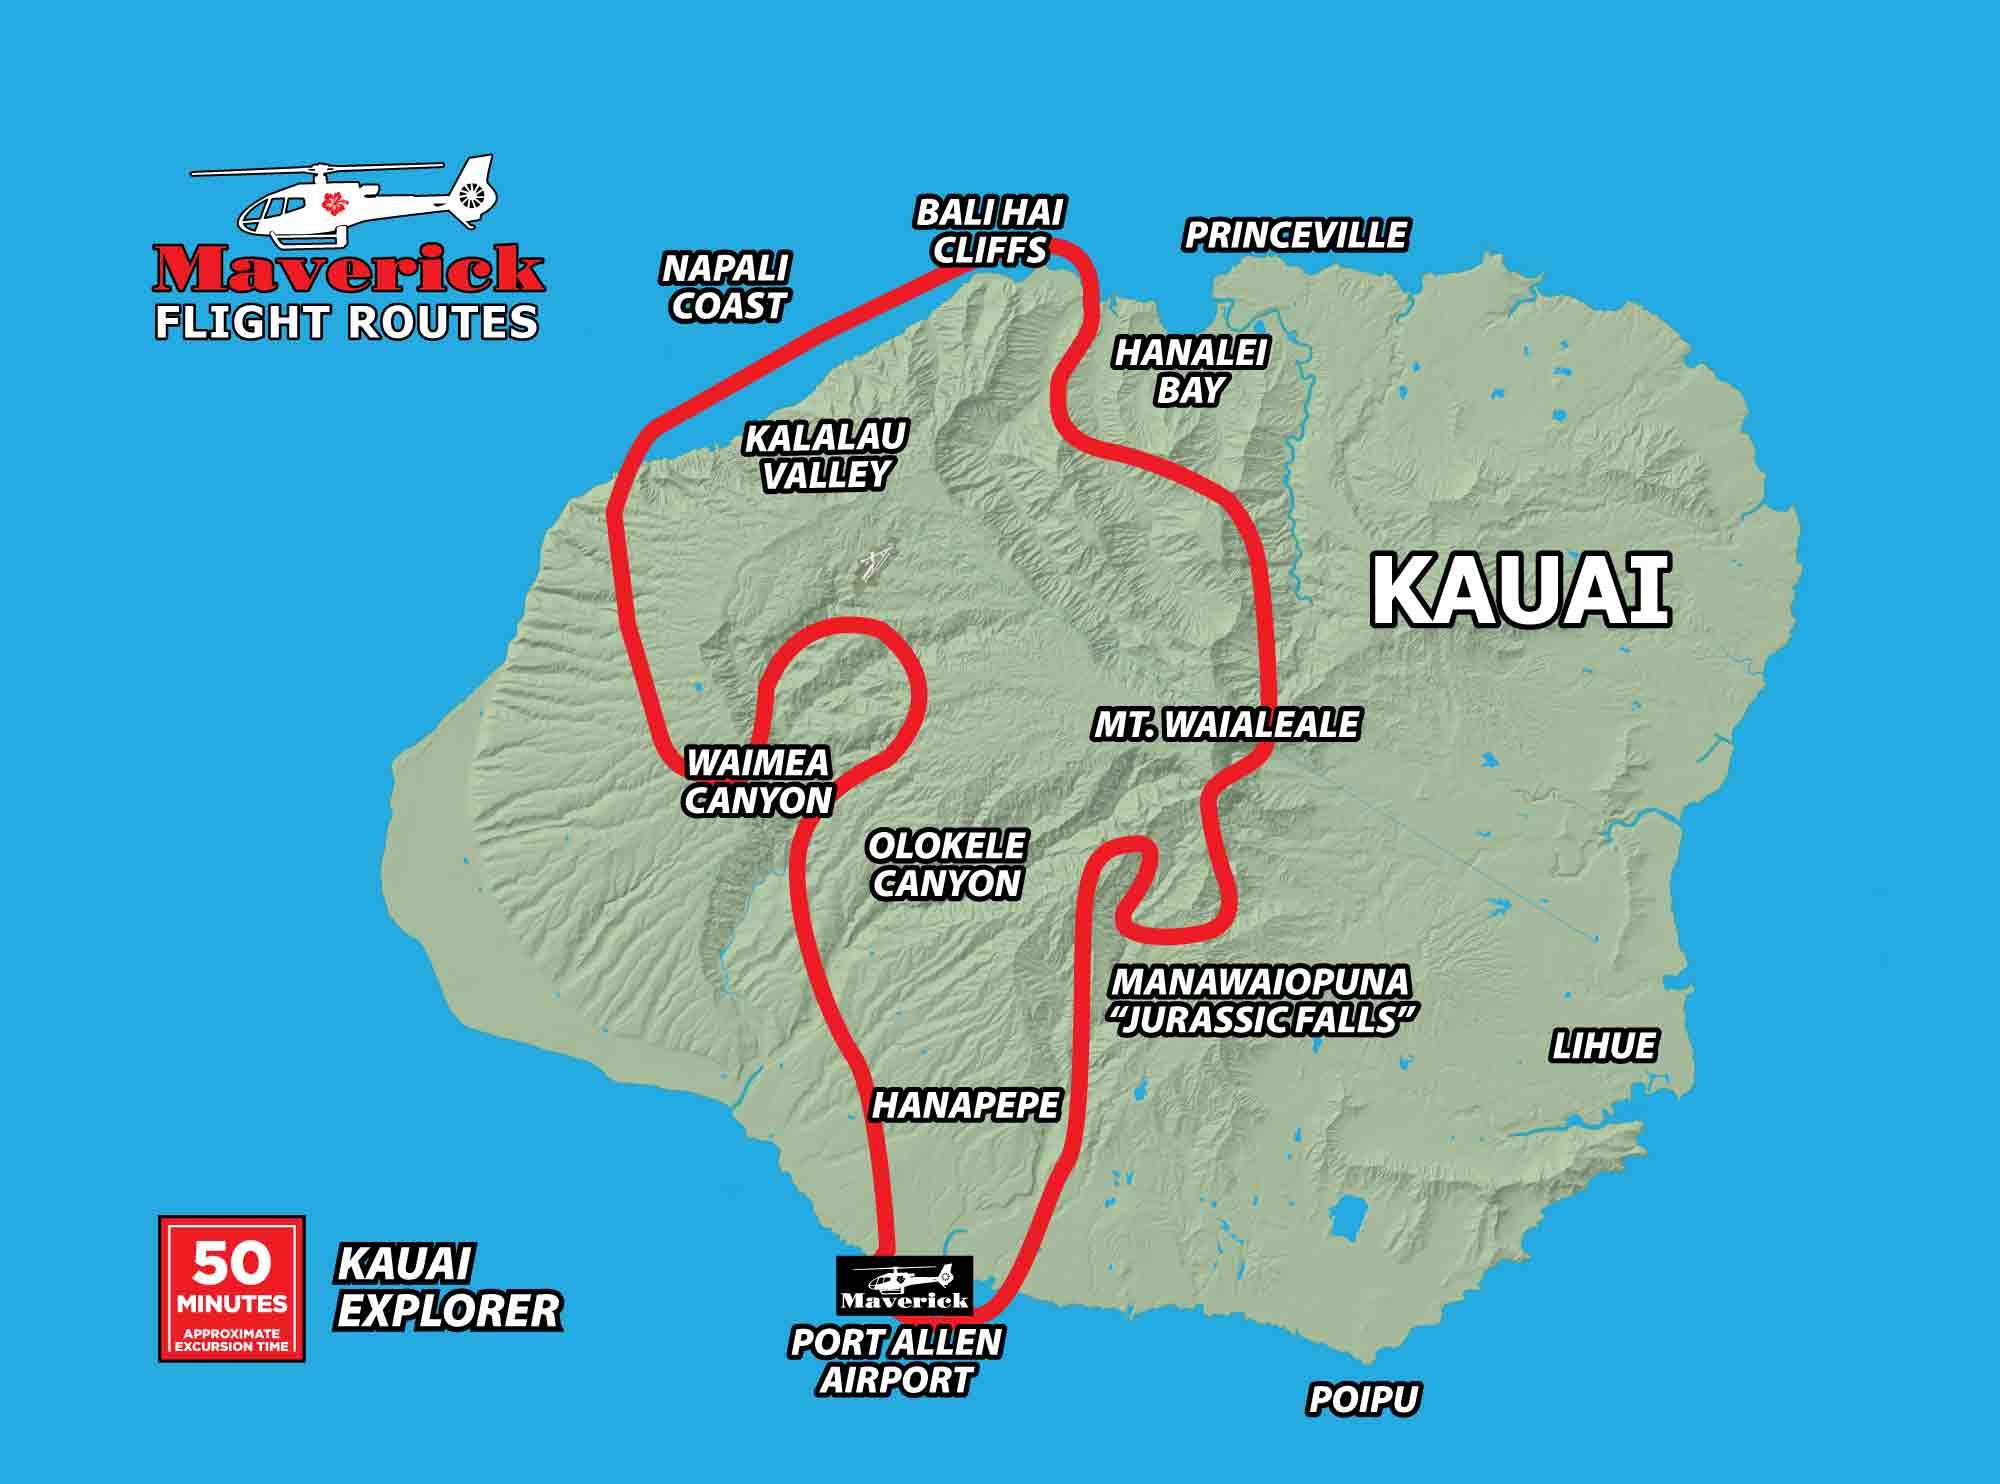 Kauai Helicopter Flight | Kauai Explorer | 808-241-7999 on maui snorkel map, kauai camping map, kauai flood zone map, lydgate park kauai map, kauai restaurant map, kauai road map, kauai ahupua a map, oahu river map, kauai hunting map, kauai cities map, kauai waterfalls, kauai recreational trail map, kauai hi beaches map, kauai bike trail map, haena kauai map, kauai beach map, kauai activities, kauai tourist map, princeville kauai map, kauai points of interest map,